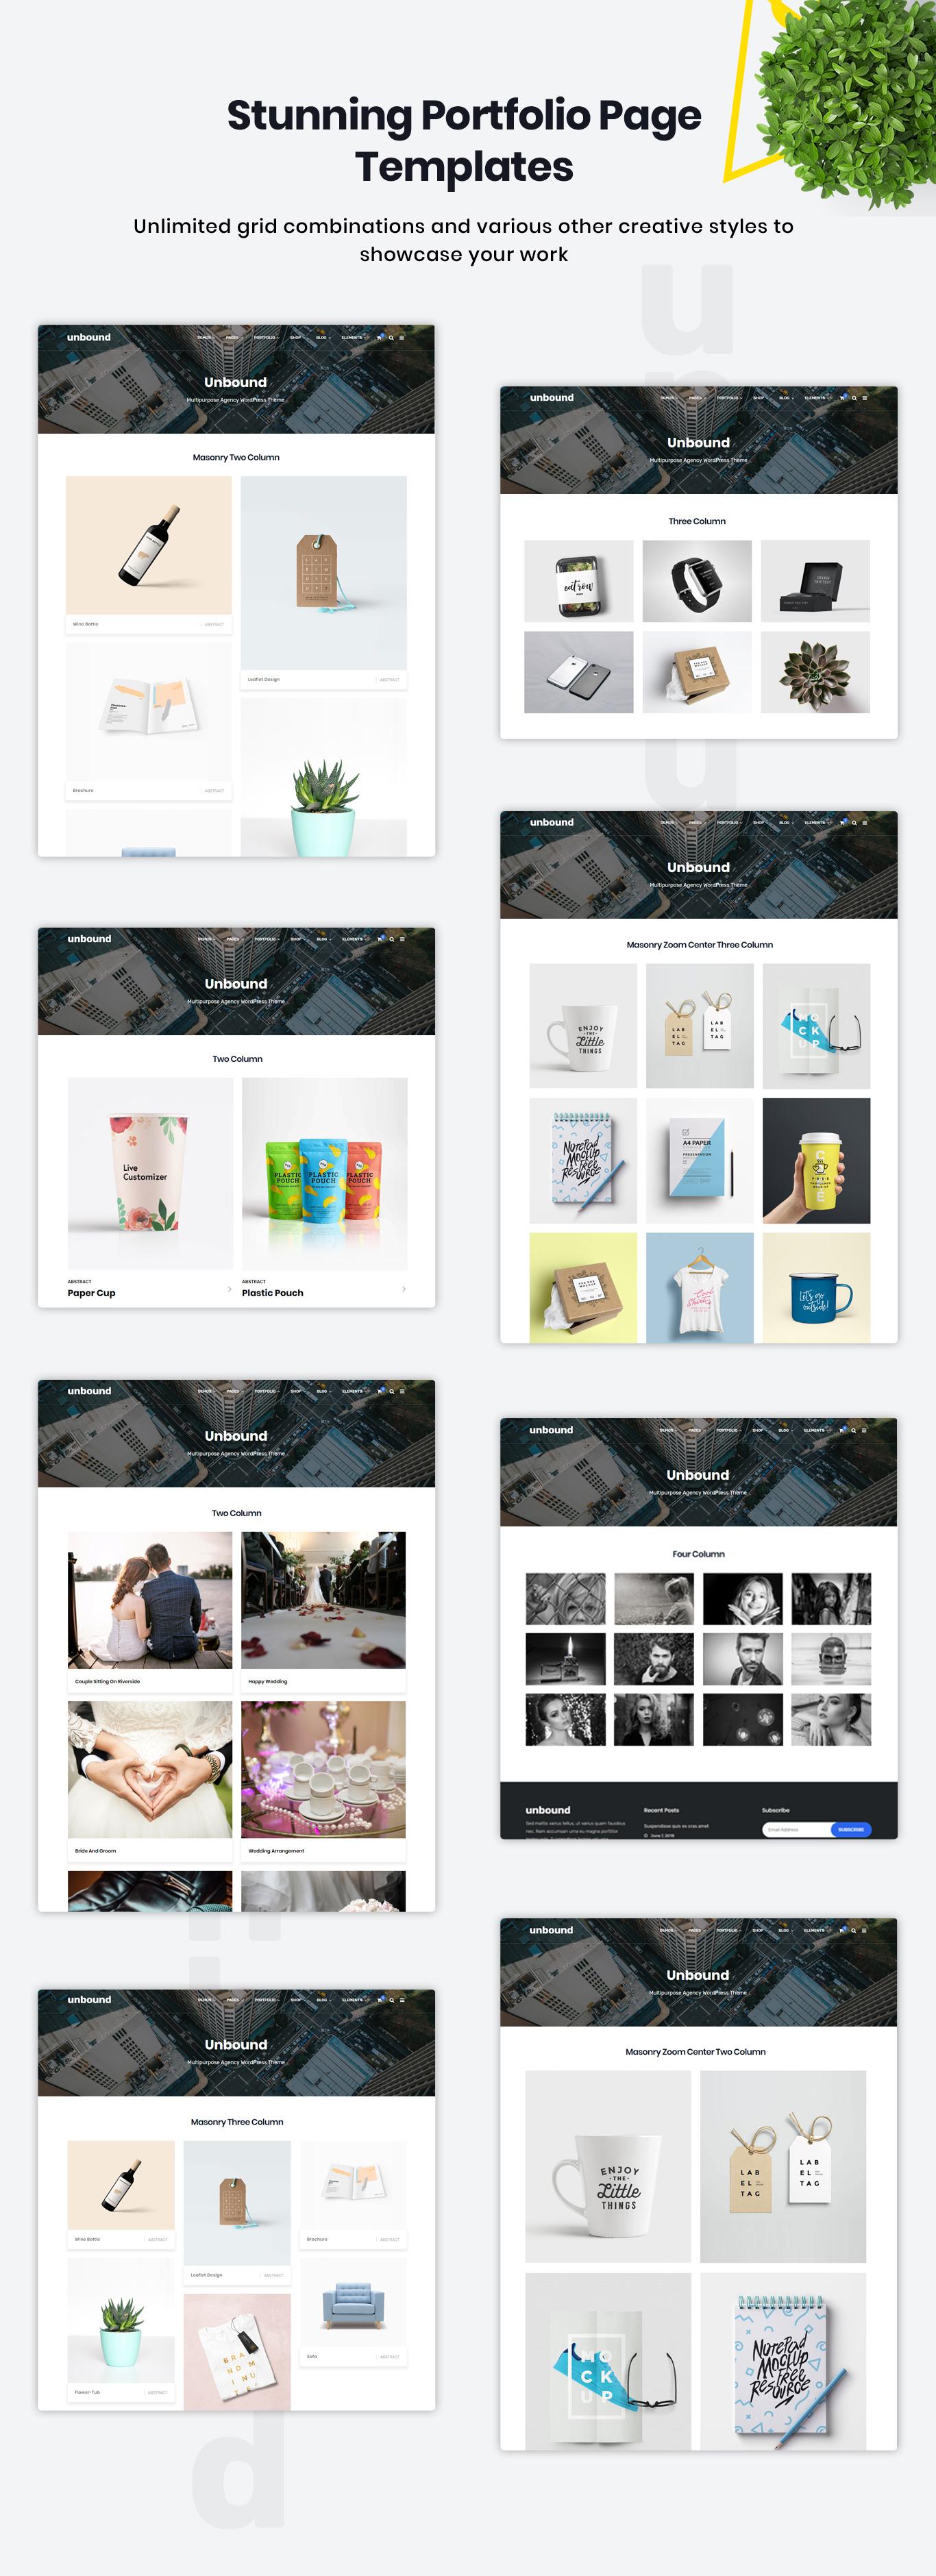 Stunning portfolio templates